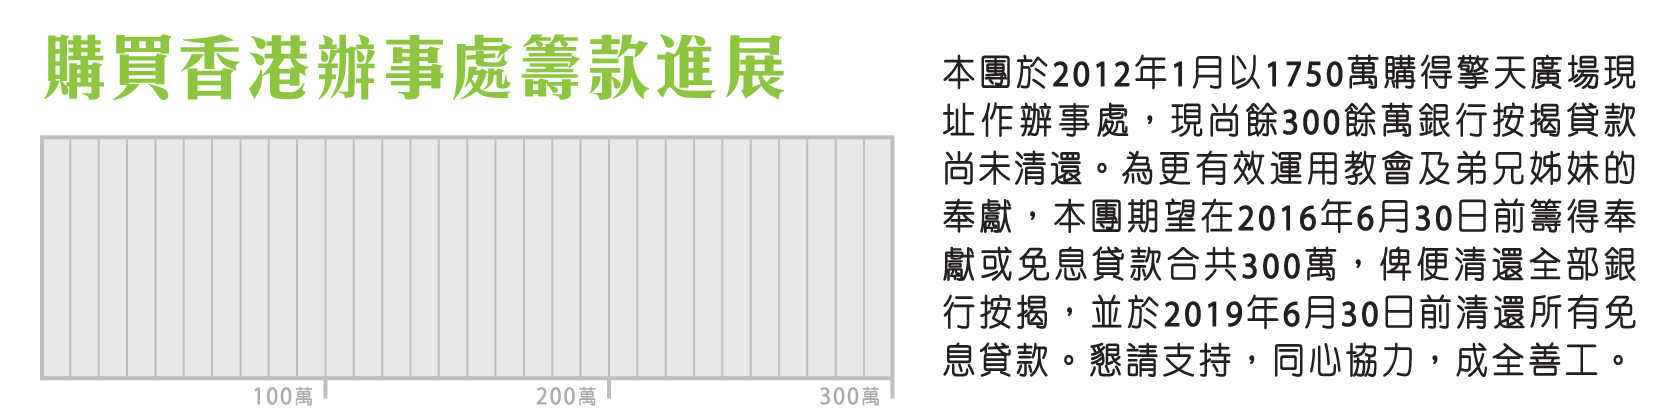 CB-02-web-banner-1680-x-420-06